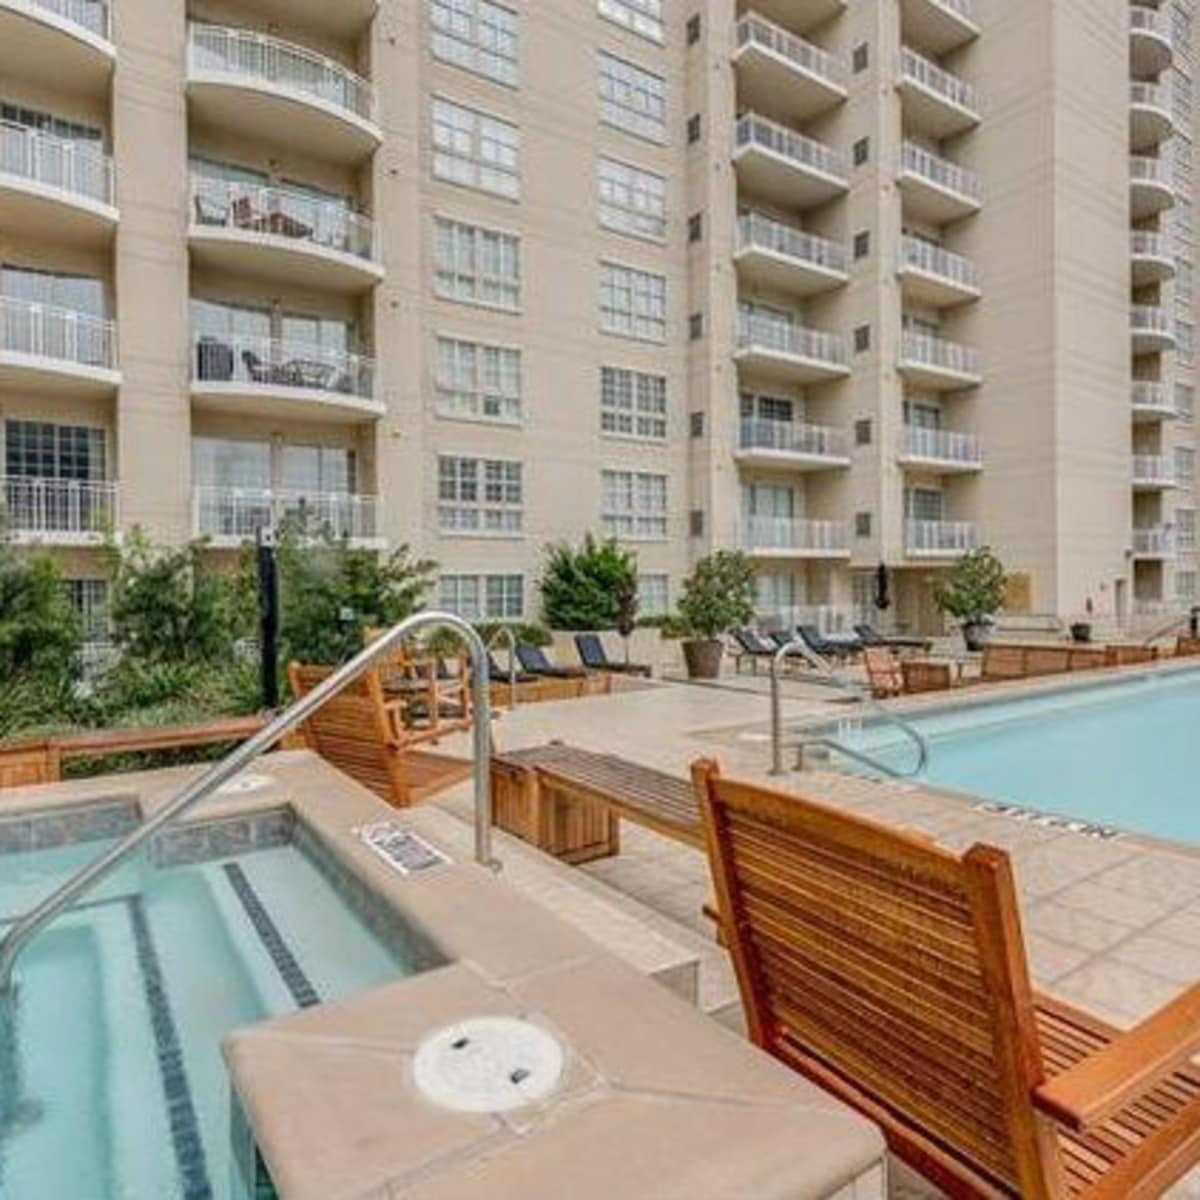 3225 Turtle Creek Blvd swimming pool